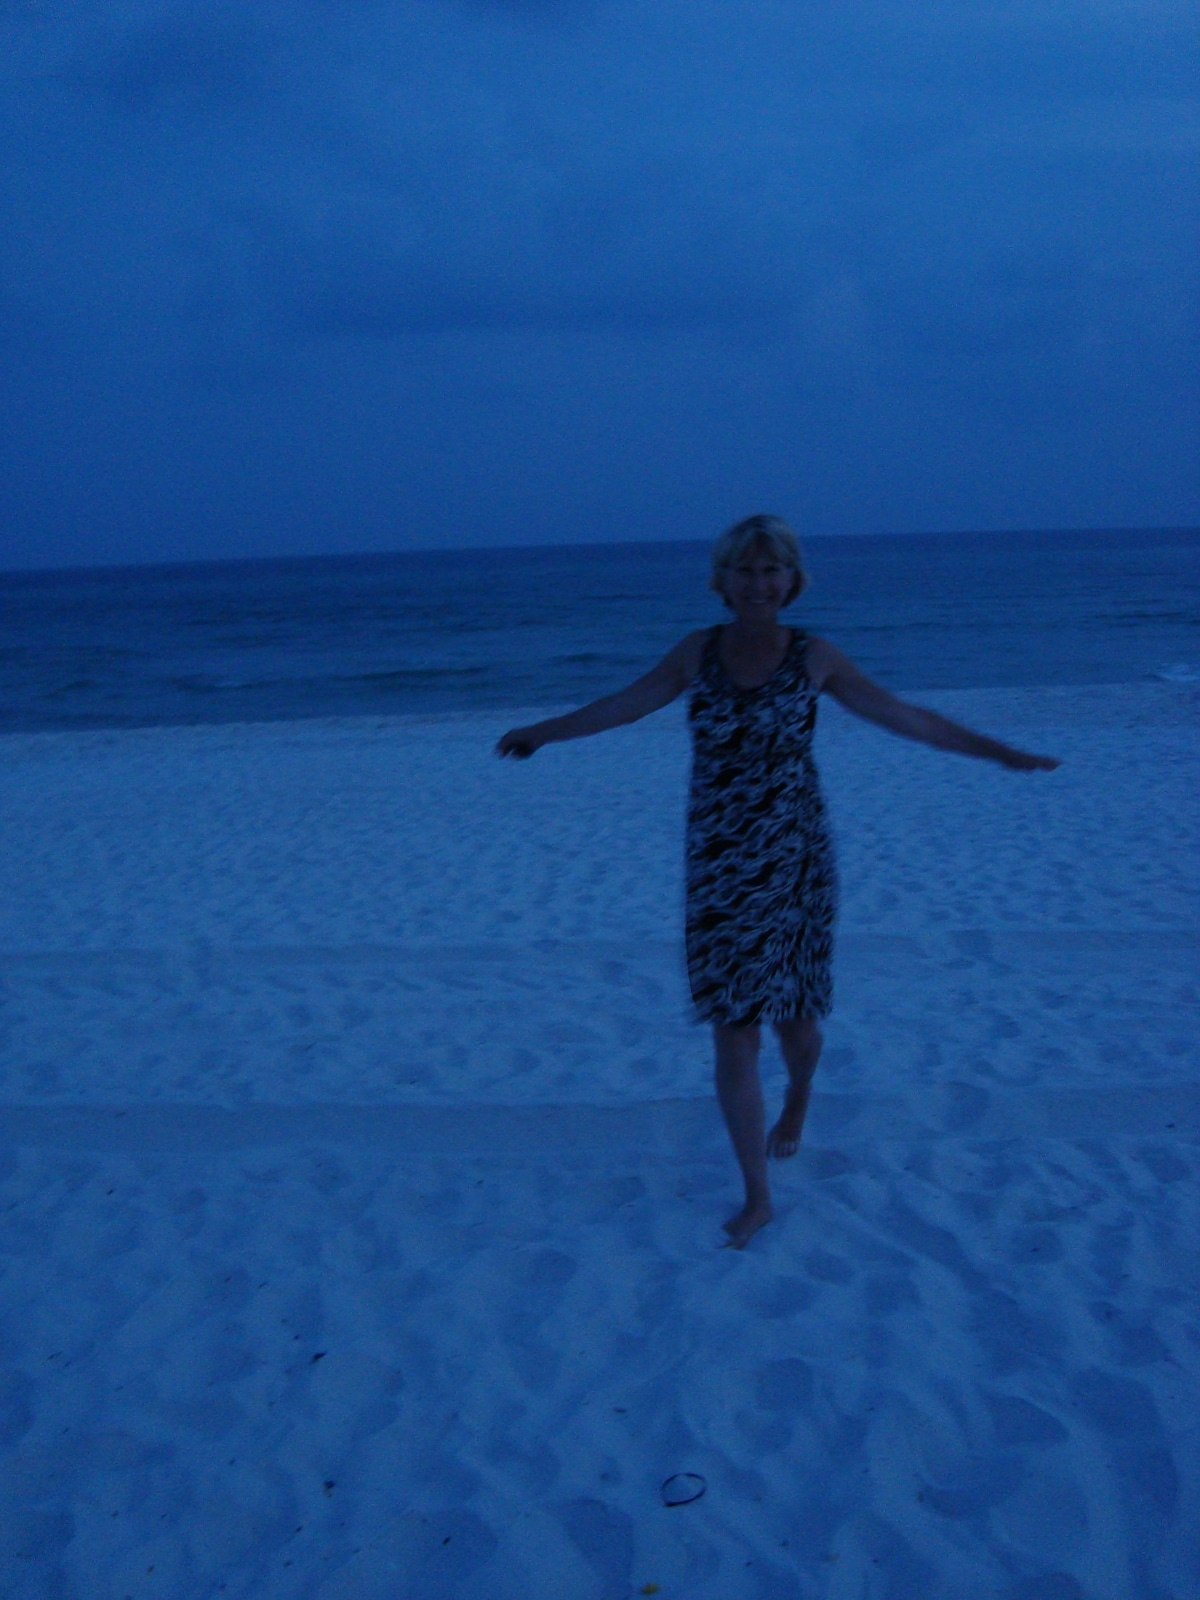 Yvette from Panama City Beach